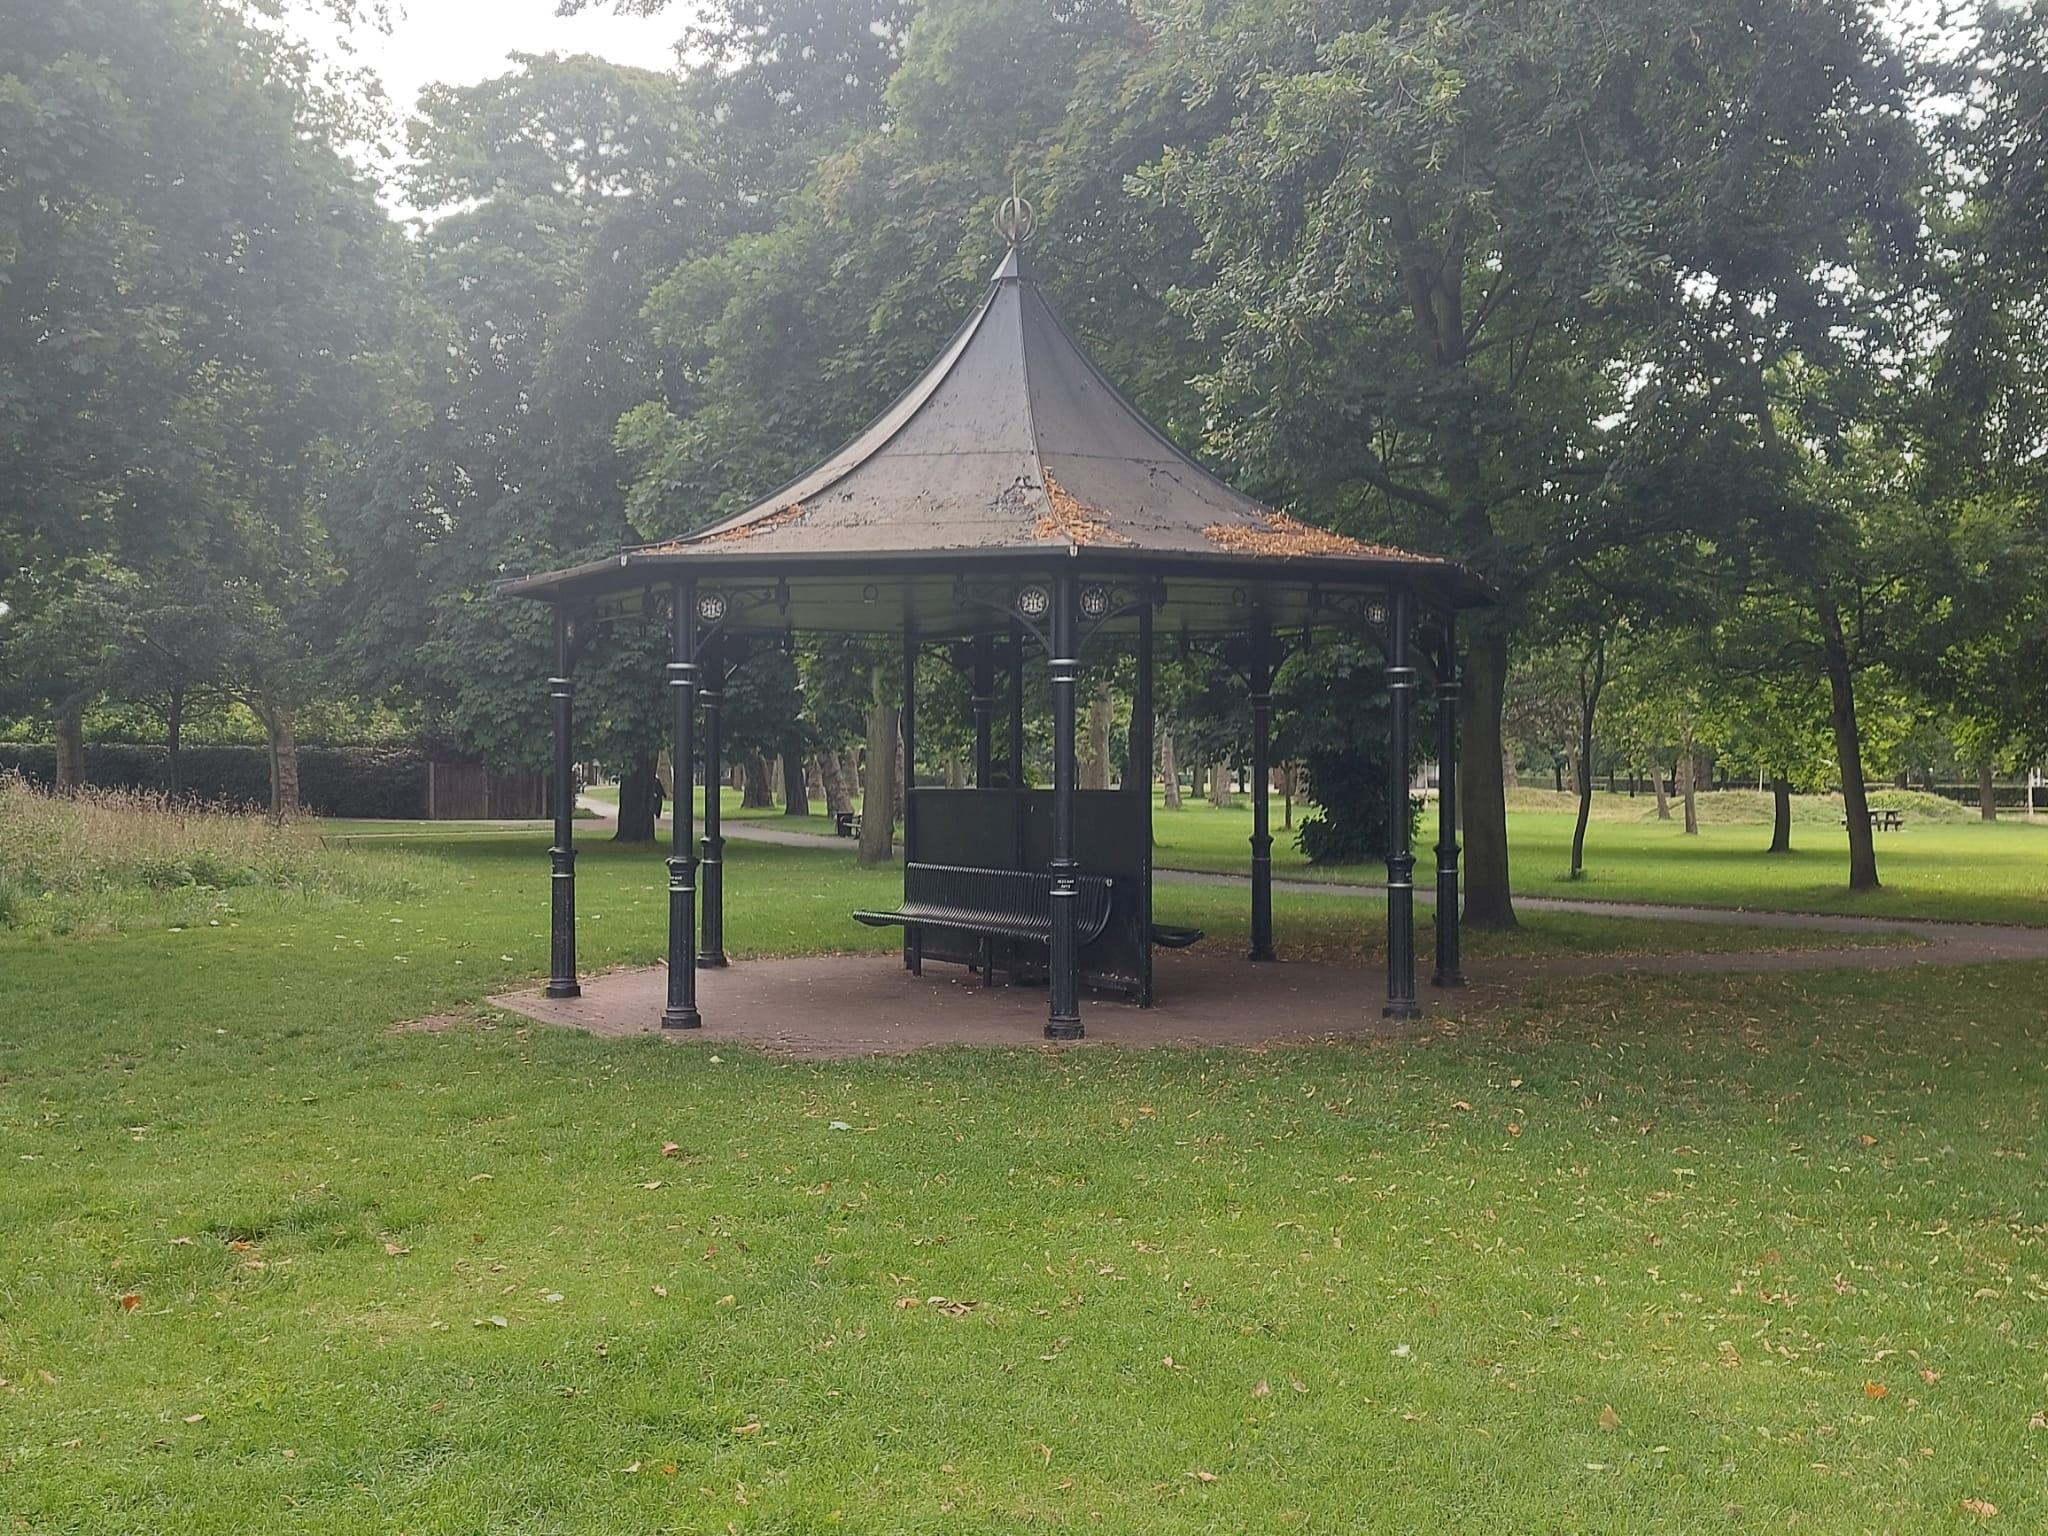 Pavilion Monkey Bars at West Ham Park Stratford | Personal Trainer Tips